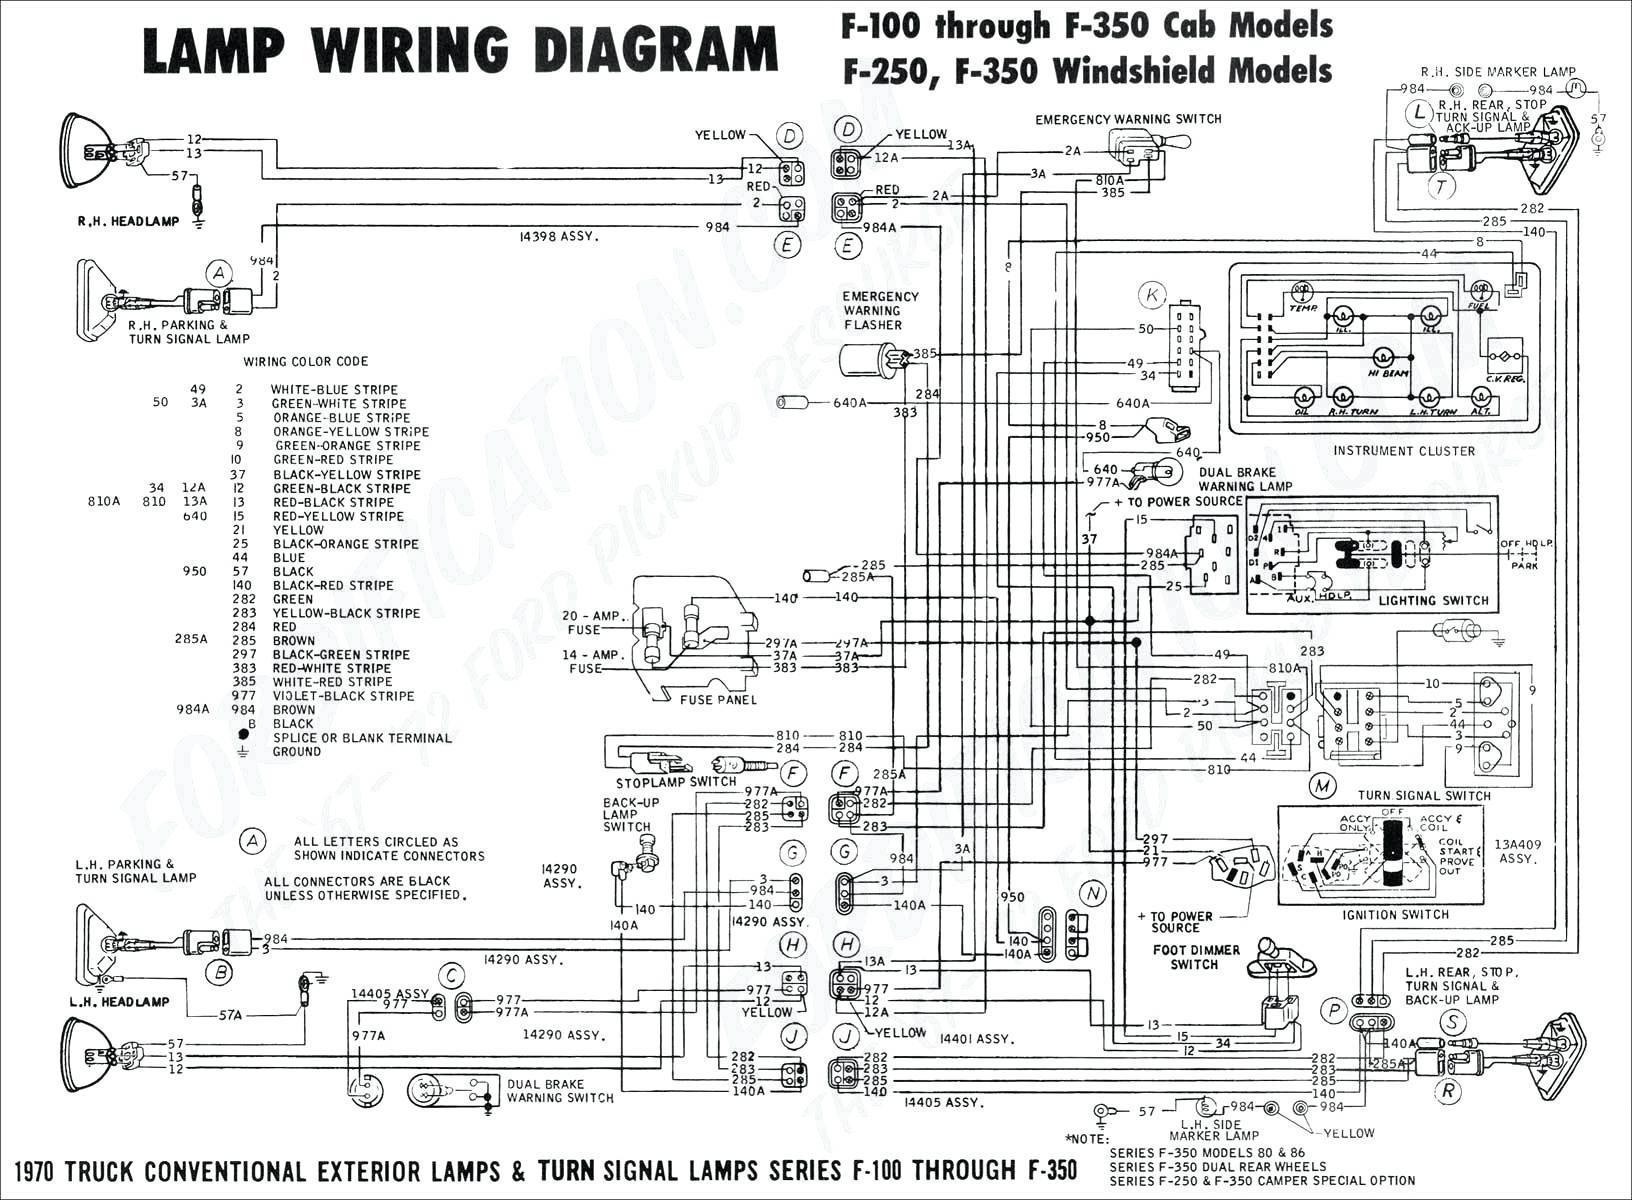 2006 Lexu Gs300 Wiring Diagram